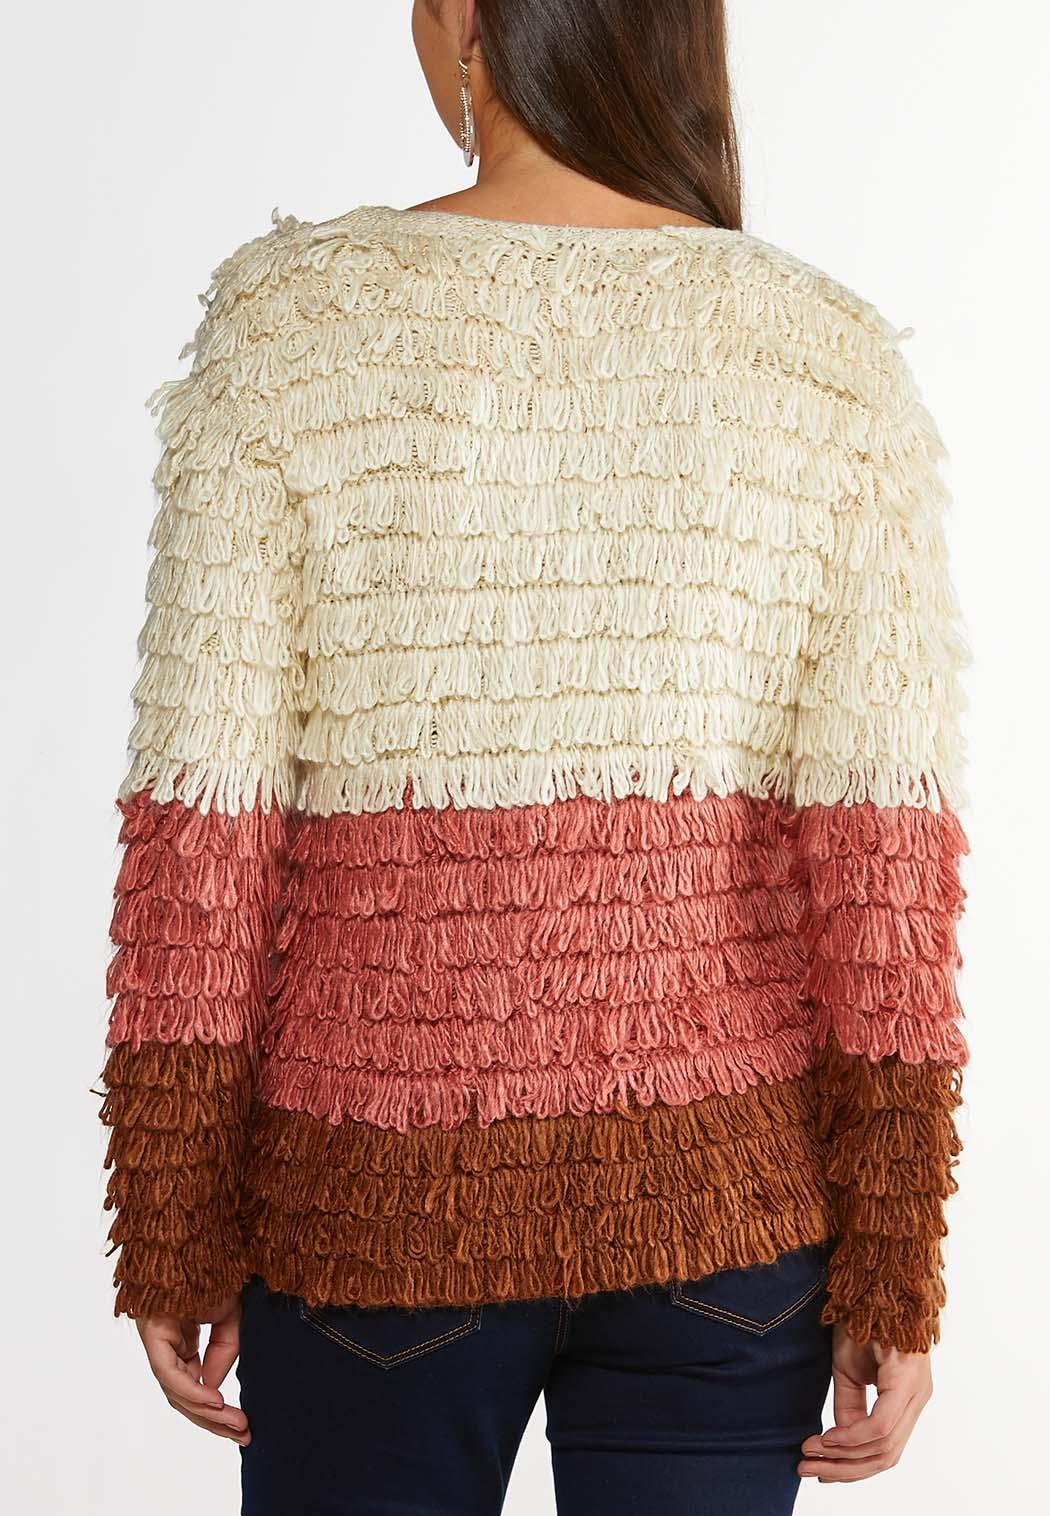 Loop Colorblock Cardigan Sweater (Item #44387129)